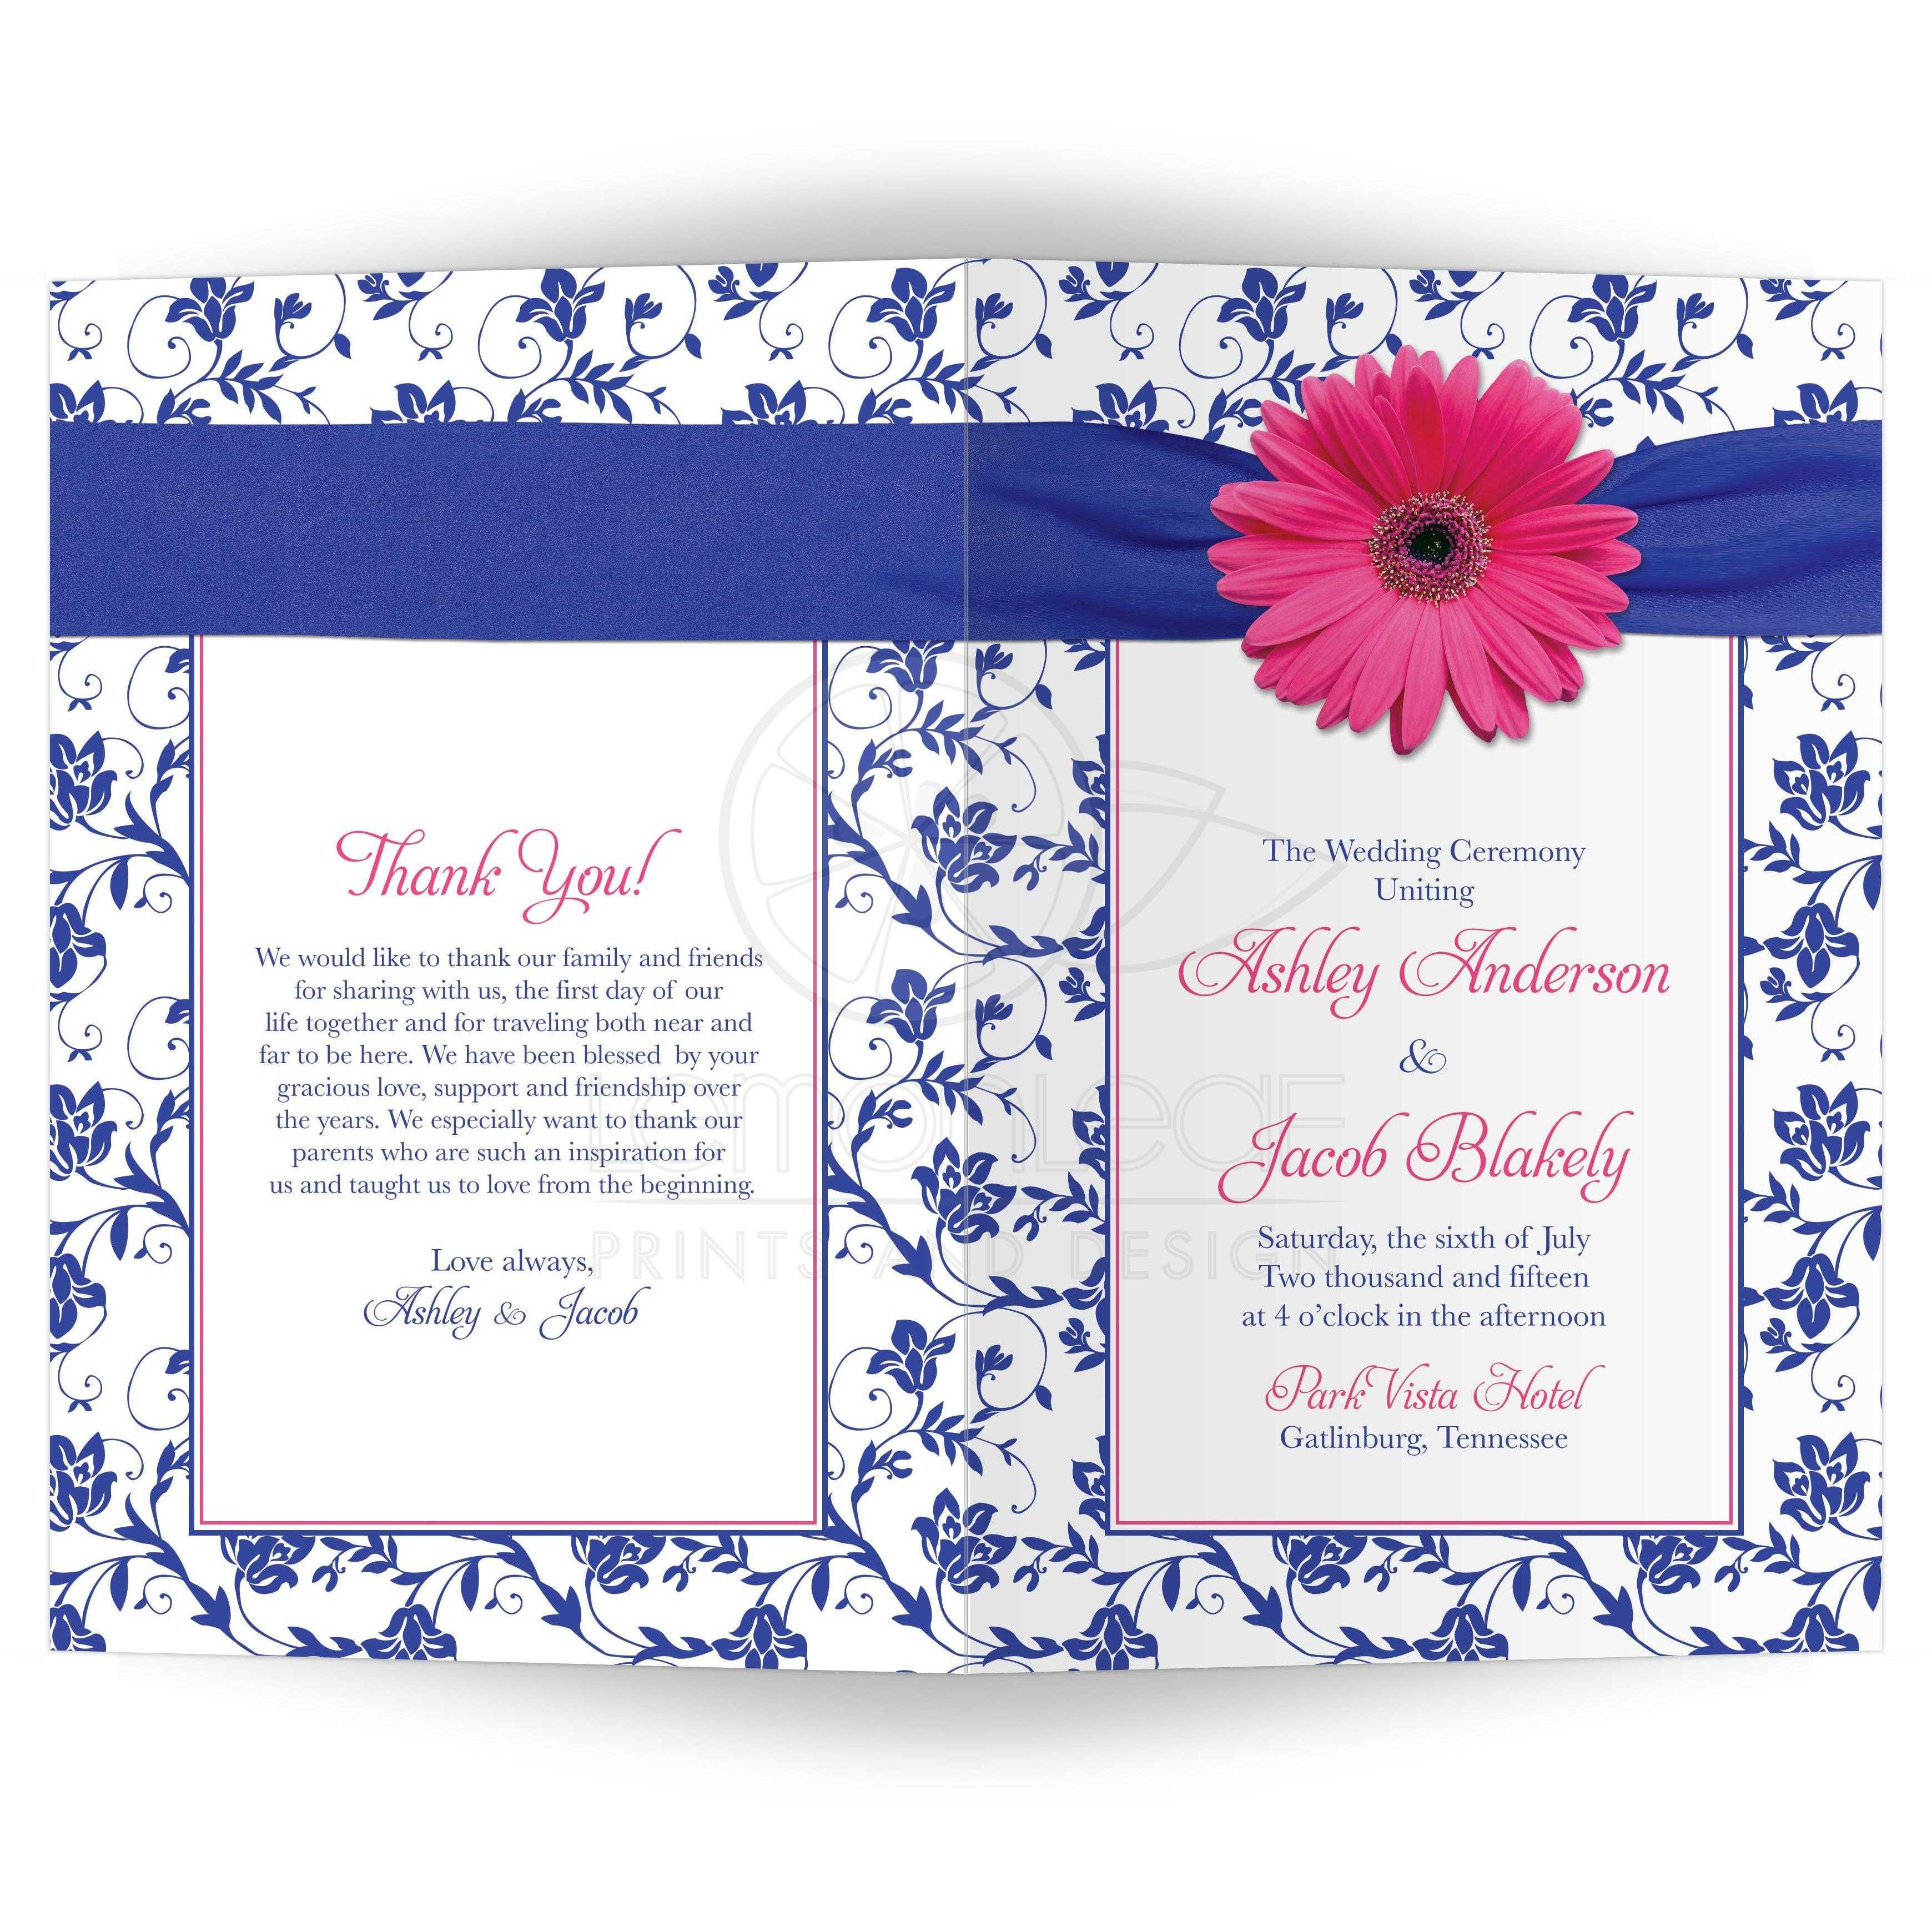 wedding program cover pink daisy royal blue damask